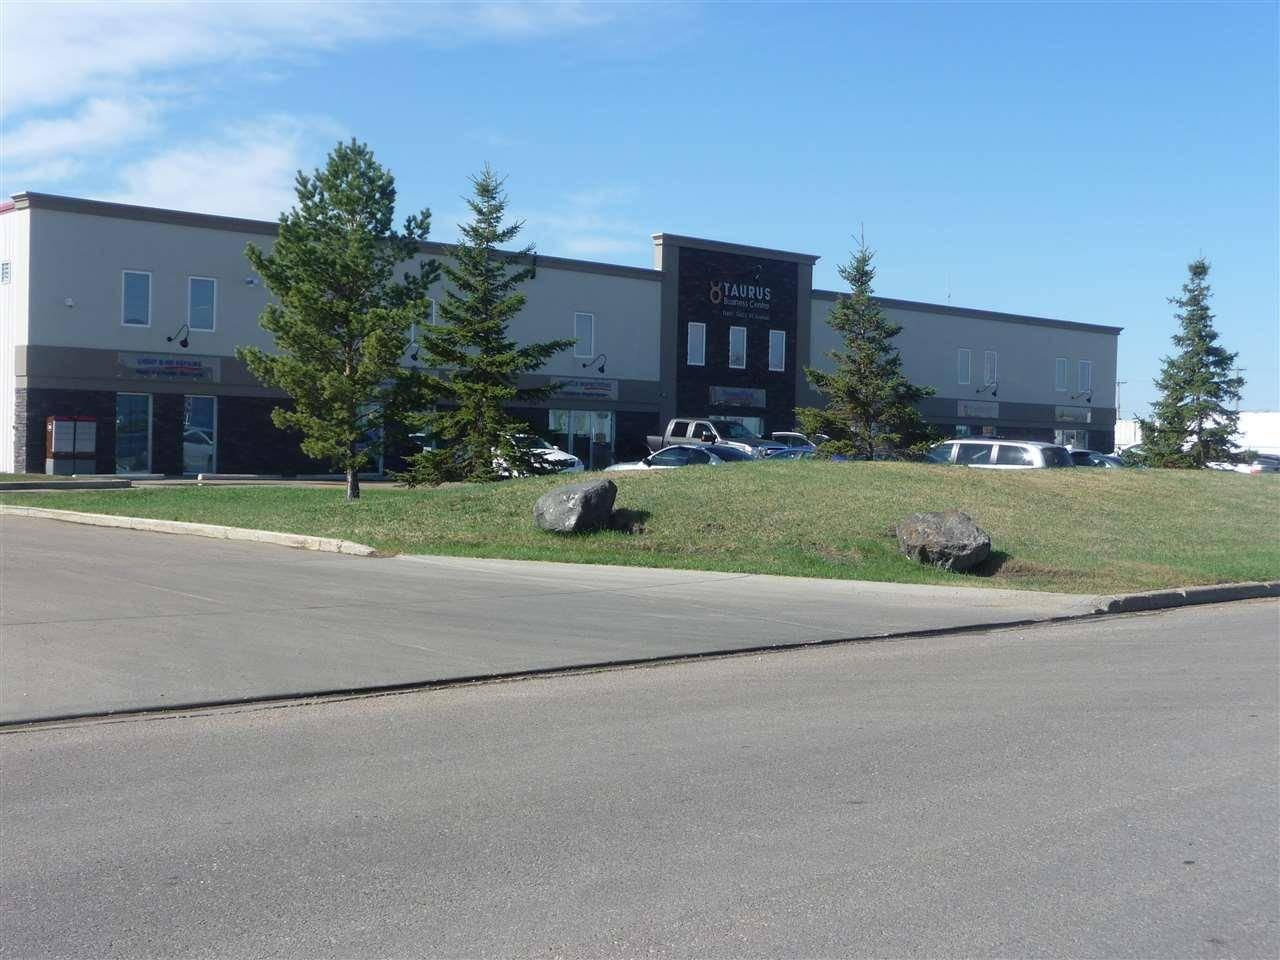 Commercial property for sale at 11401 85 Ave Fort Saskatchewan Alberta - MLS: E4135715